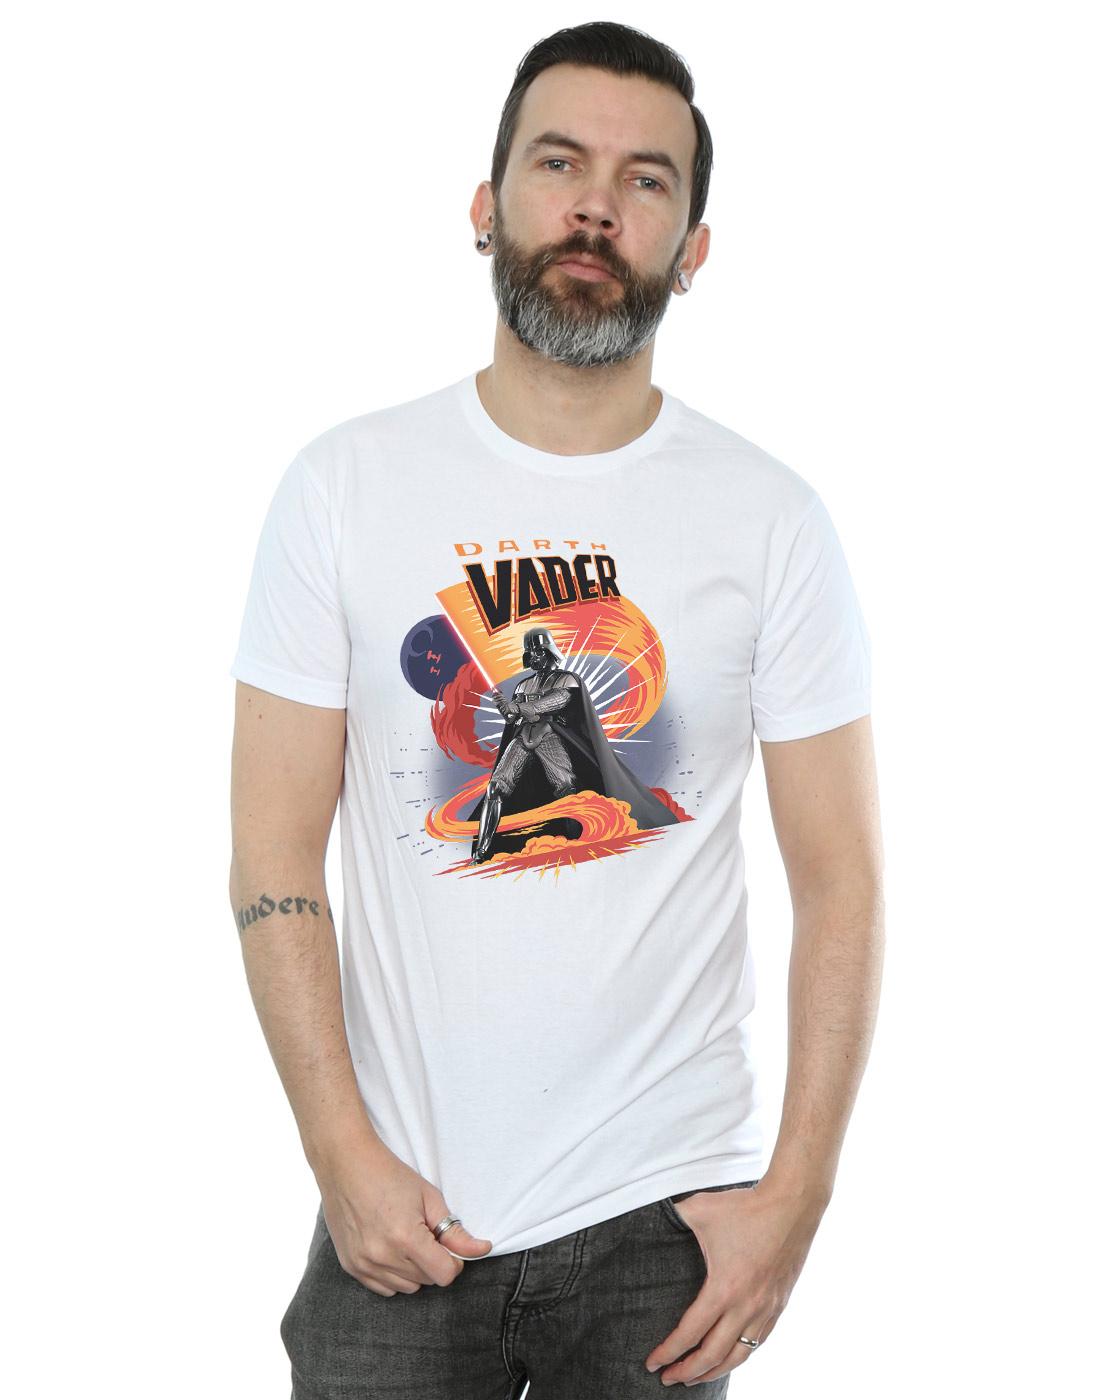 Darth-Vader-T-Shirt-Mens-Official-Star-Wars-Merchandise